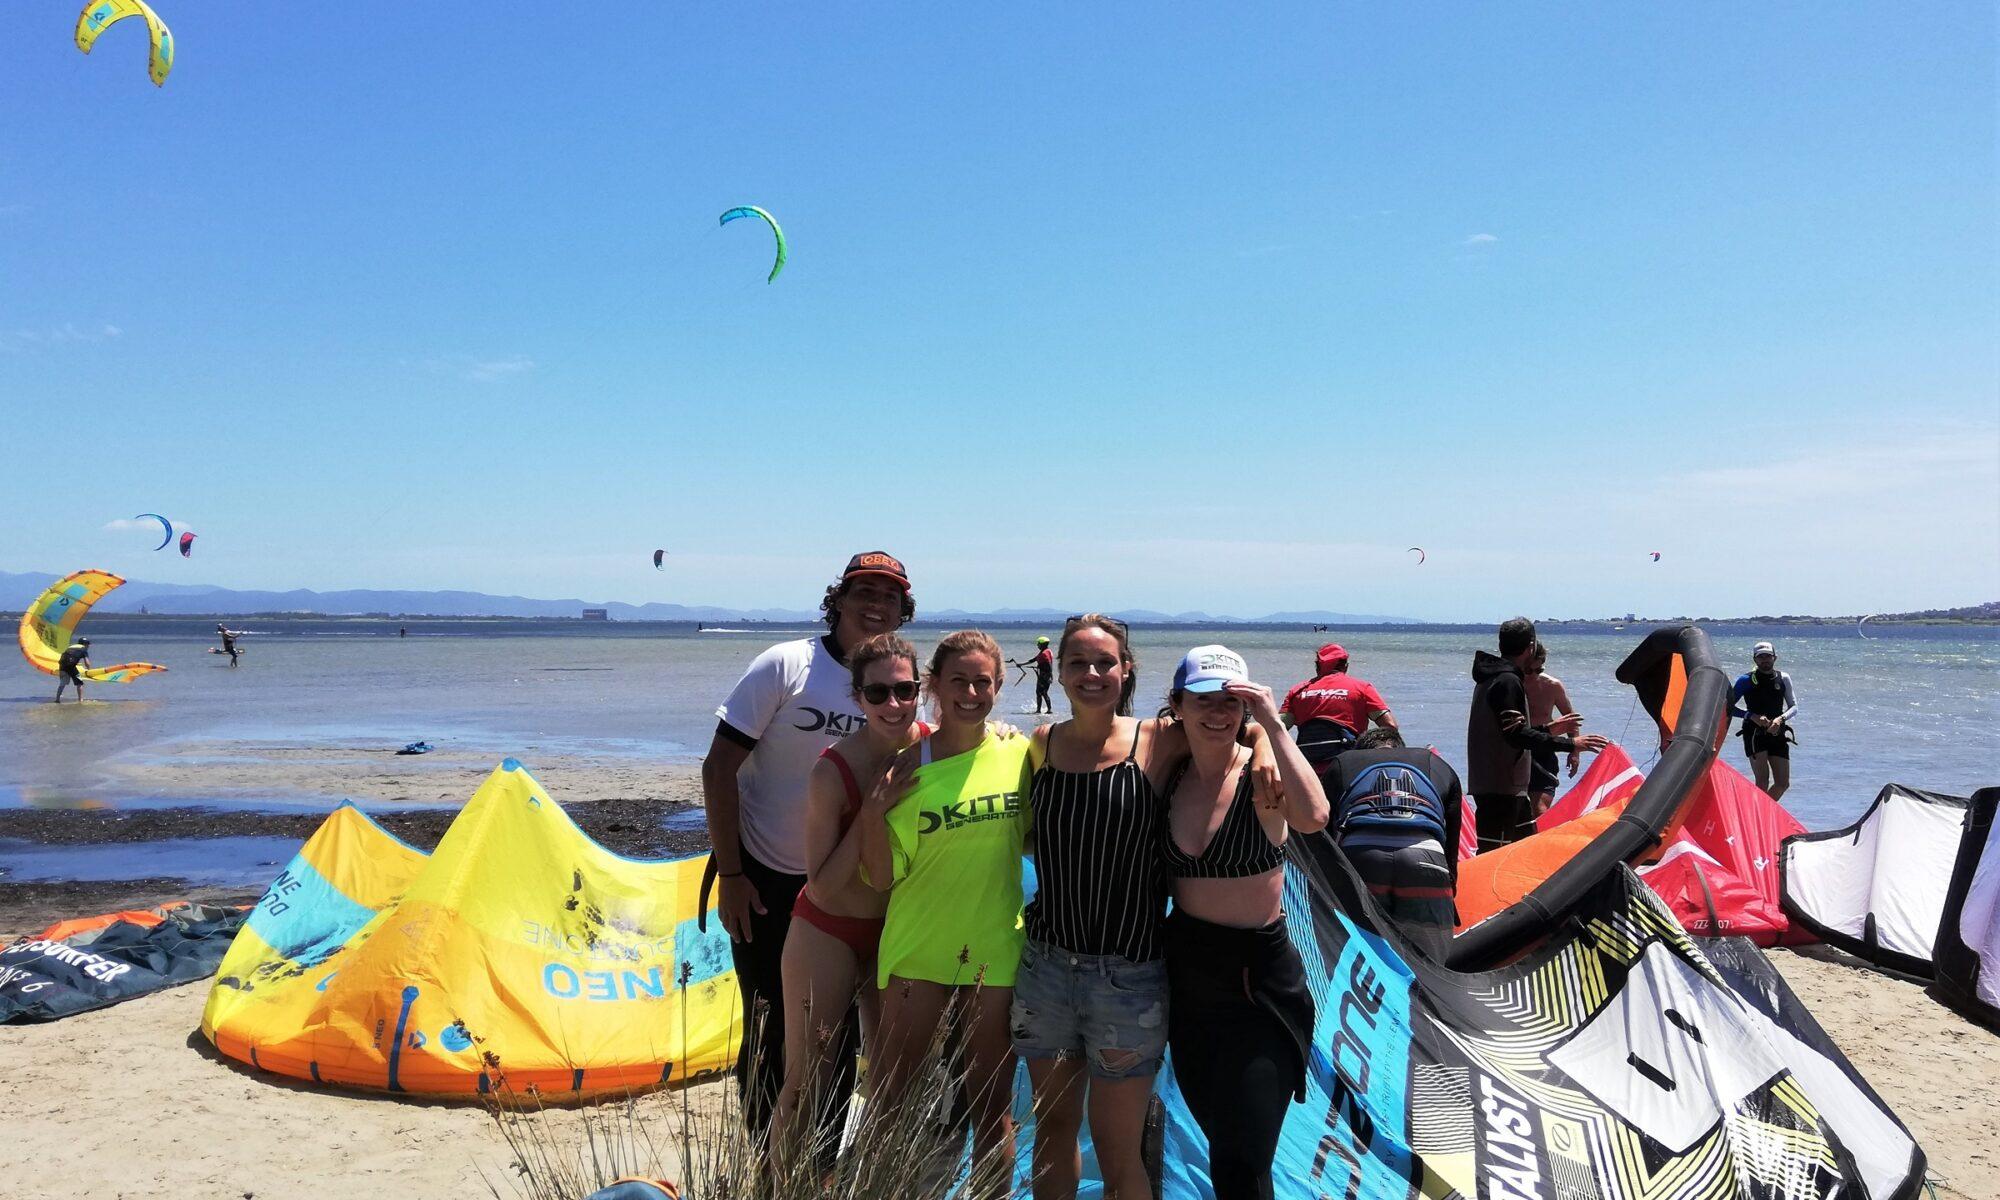 Impara il kitesurf con un Kite Camp a Punta Trettu in Sardegna